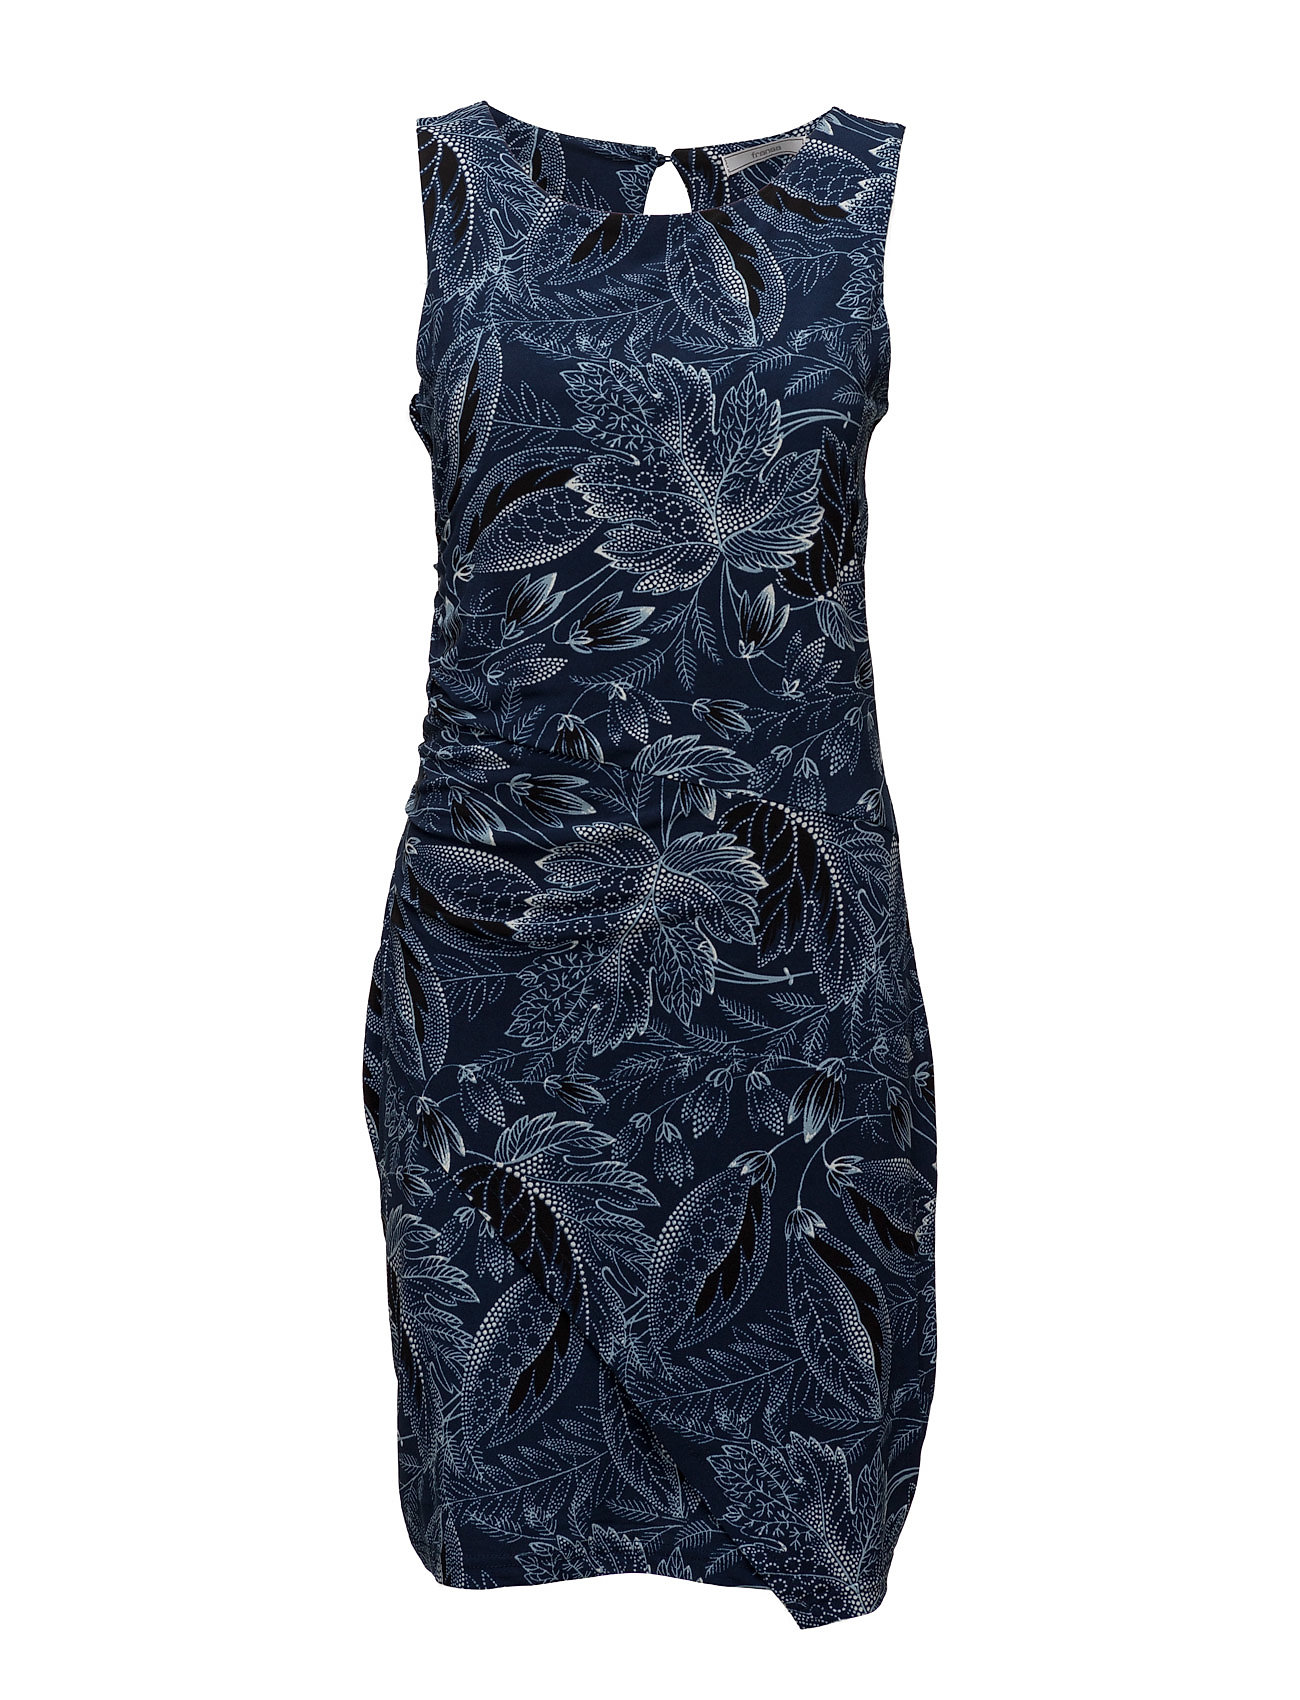 Imself 1 Dress Fransa Dresses thumbnail